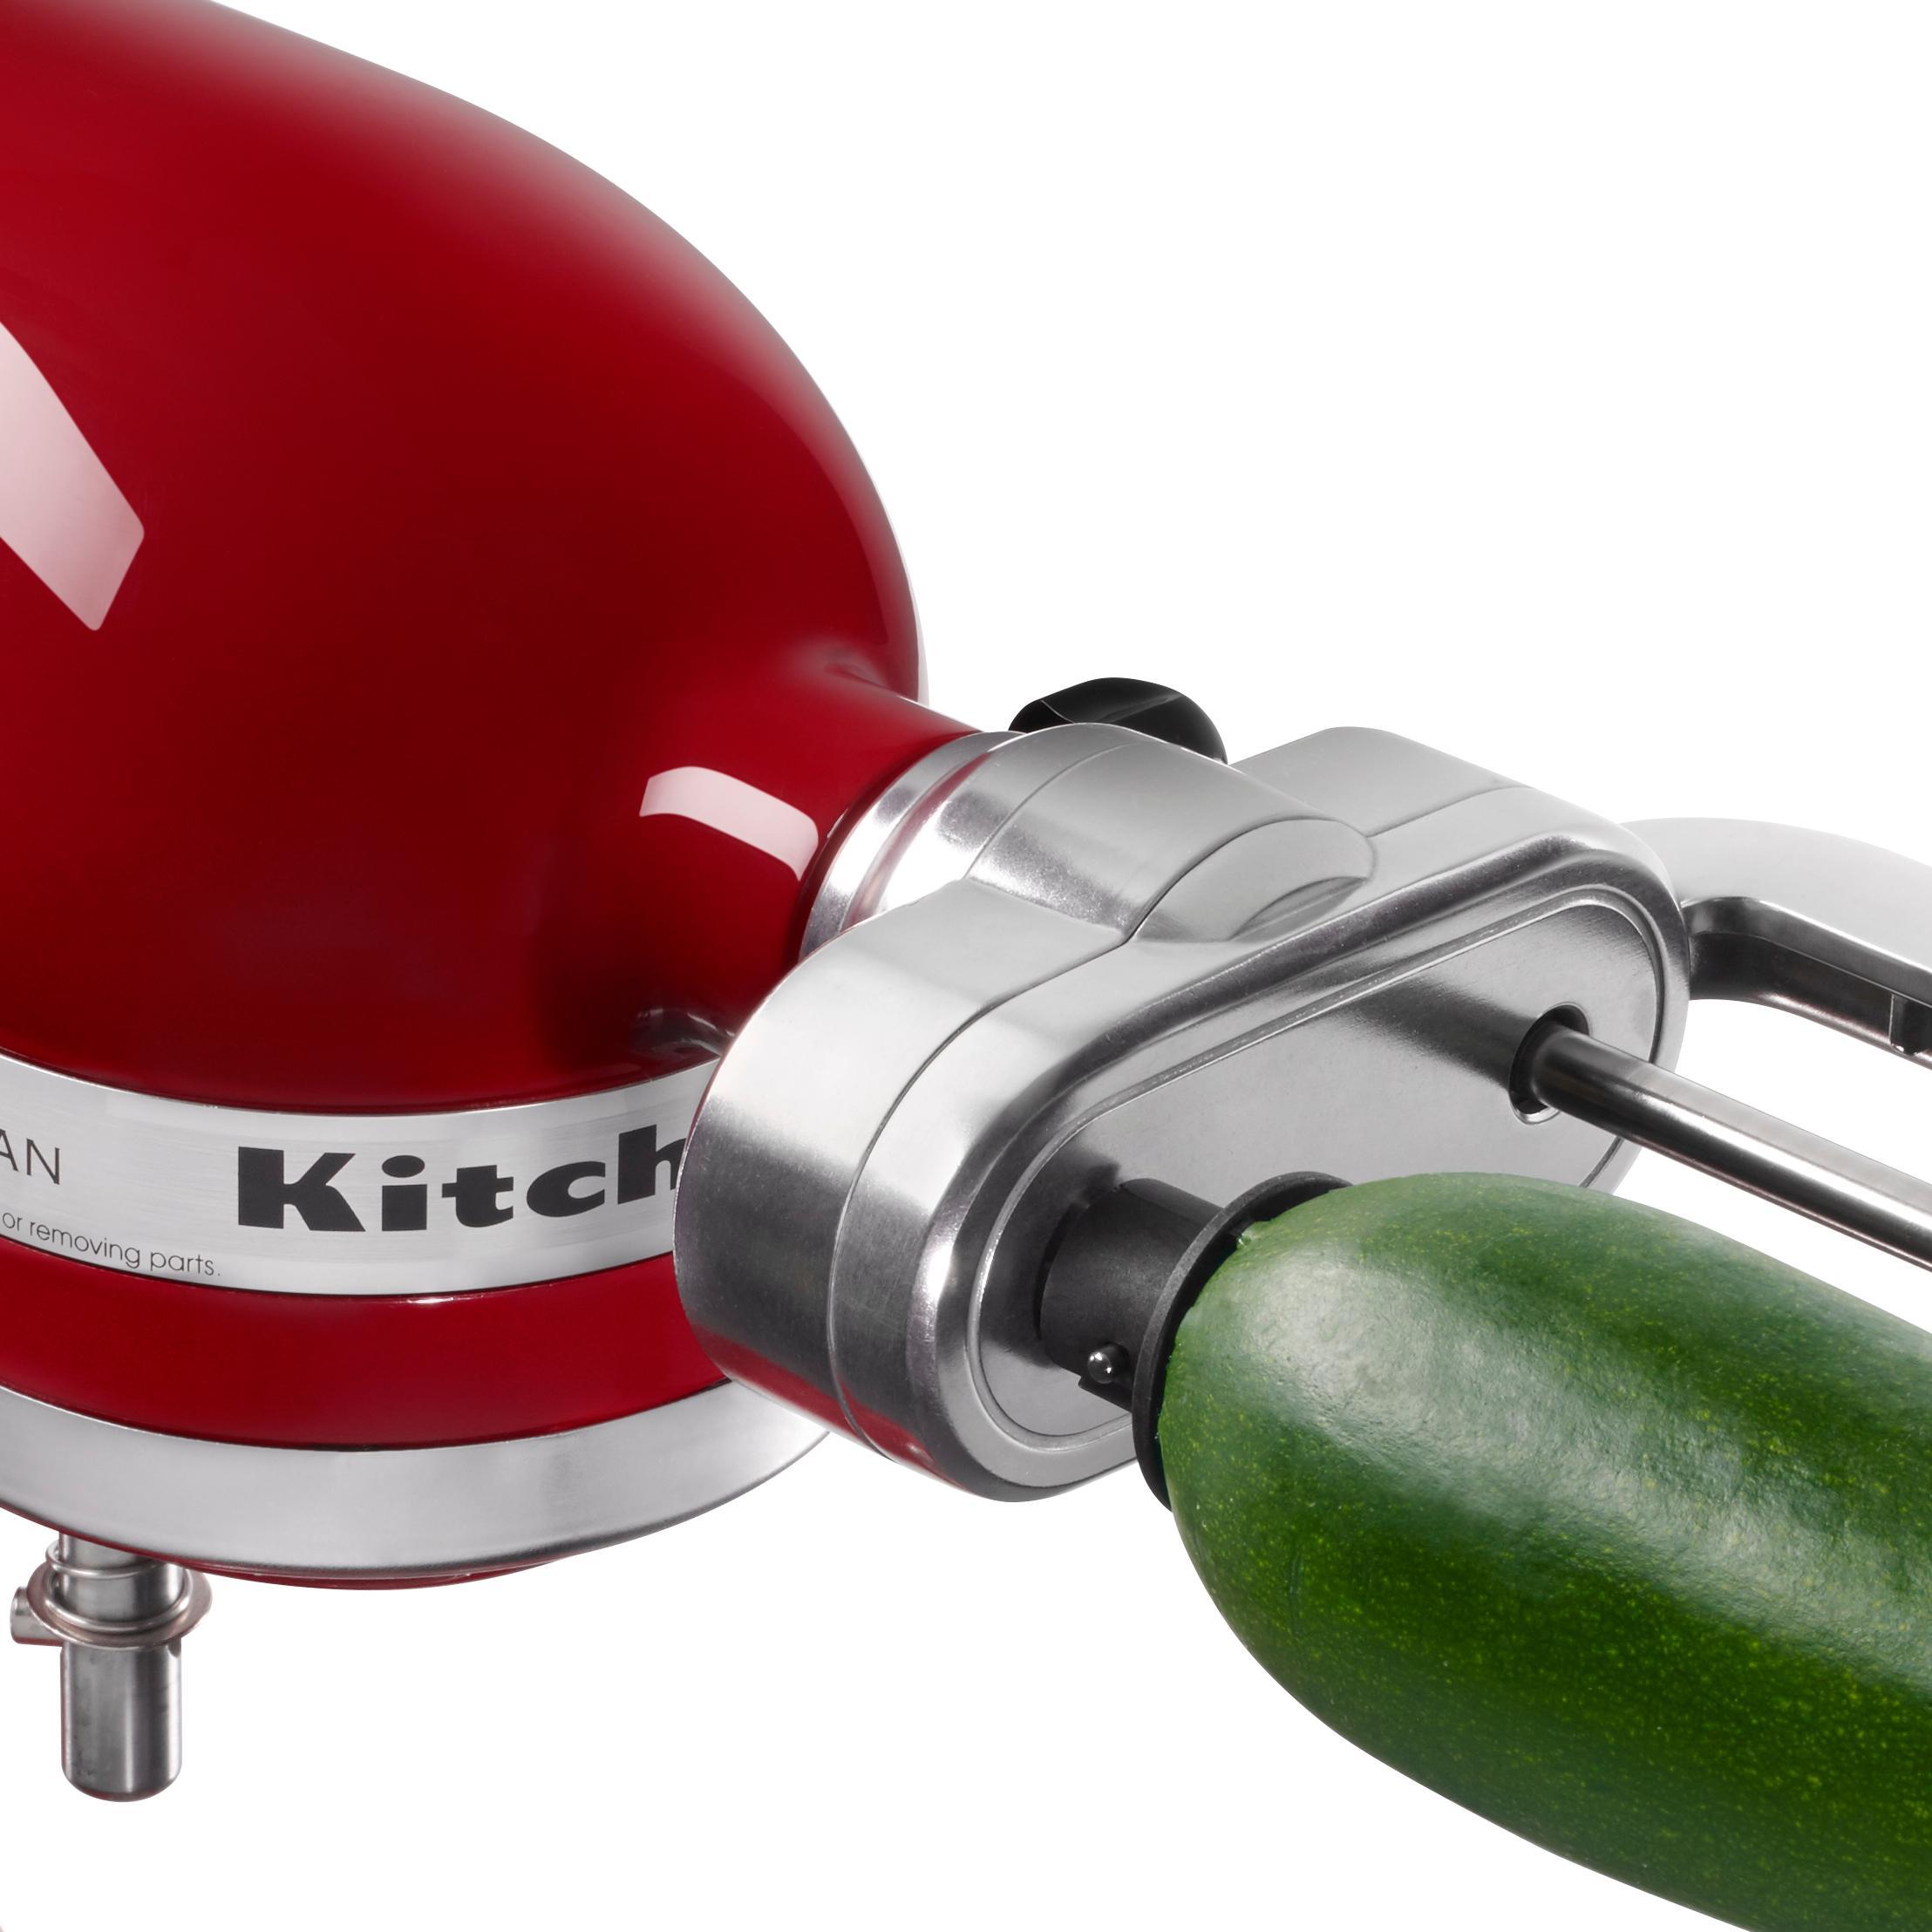 KitchenAid R-KSM1APC Spiralizer Attachment with Peel, Core & Slice  (CERTIFIED REFURBISHED)